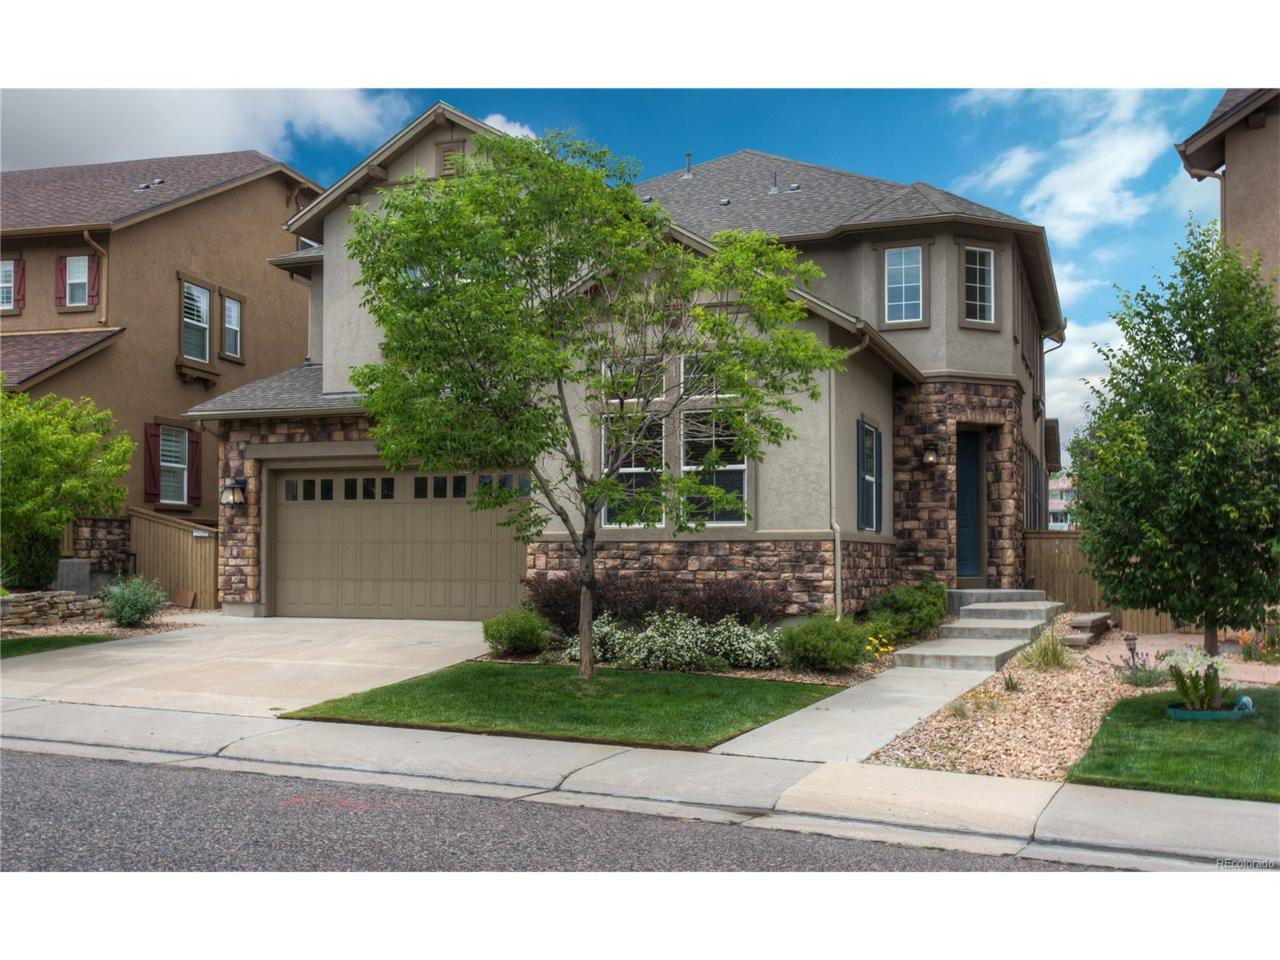 4467 Valleybrook Drive, Highlands Ranch, CO 80130 (MLS #8868207) :: 8z Real Estate